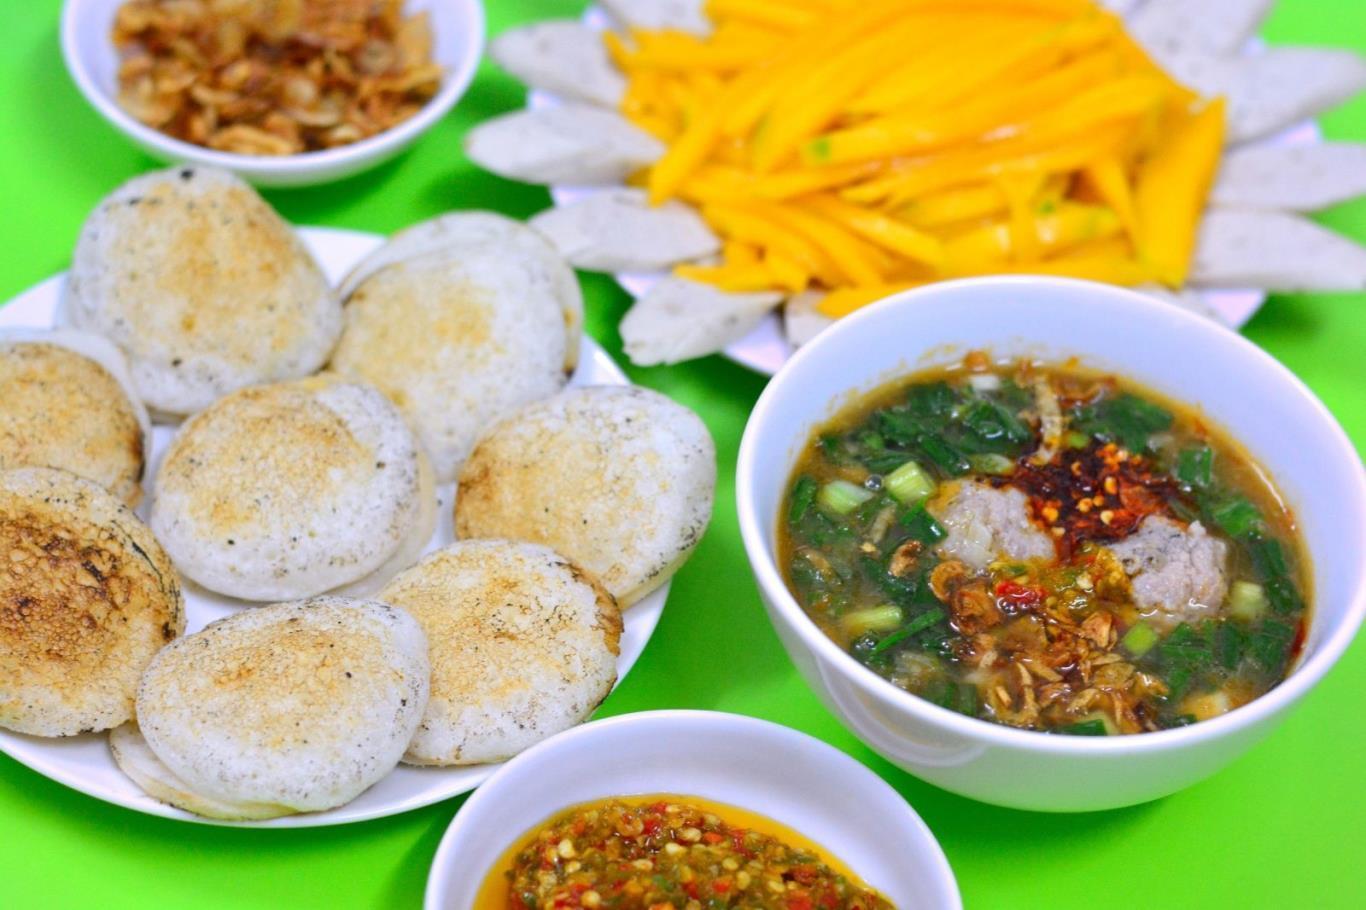 https://www.chudu24.com/wp-content/uploads/2018/02/3-mon-an-Phan-Thiet-ma-ban-khong-the-bo-lo-8.jpg